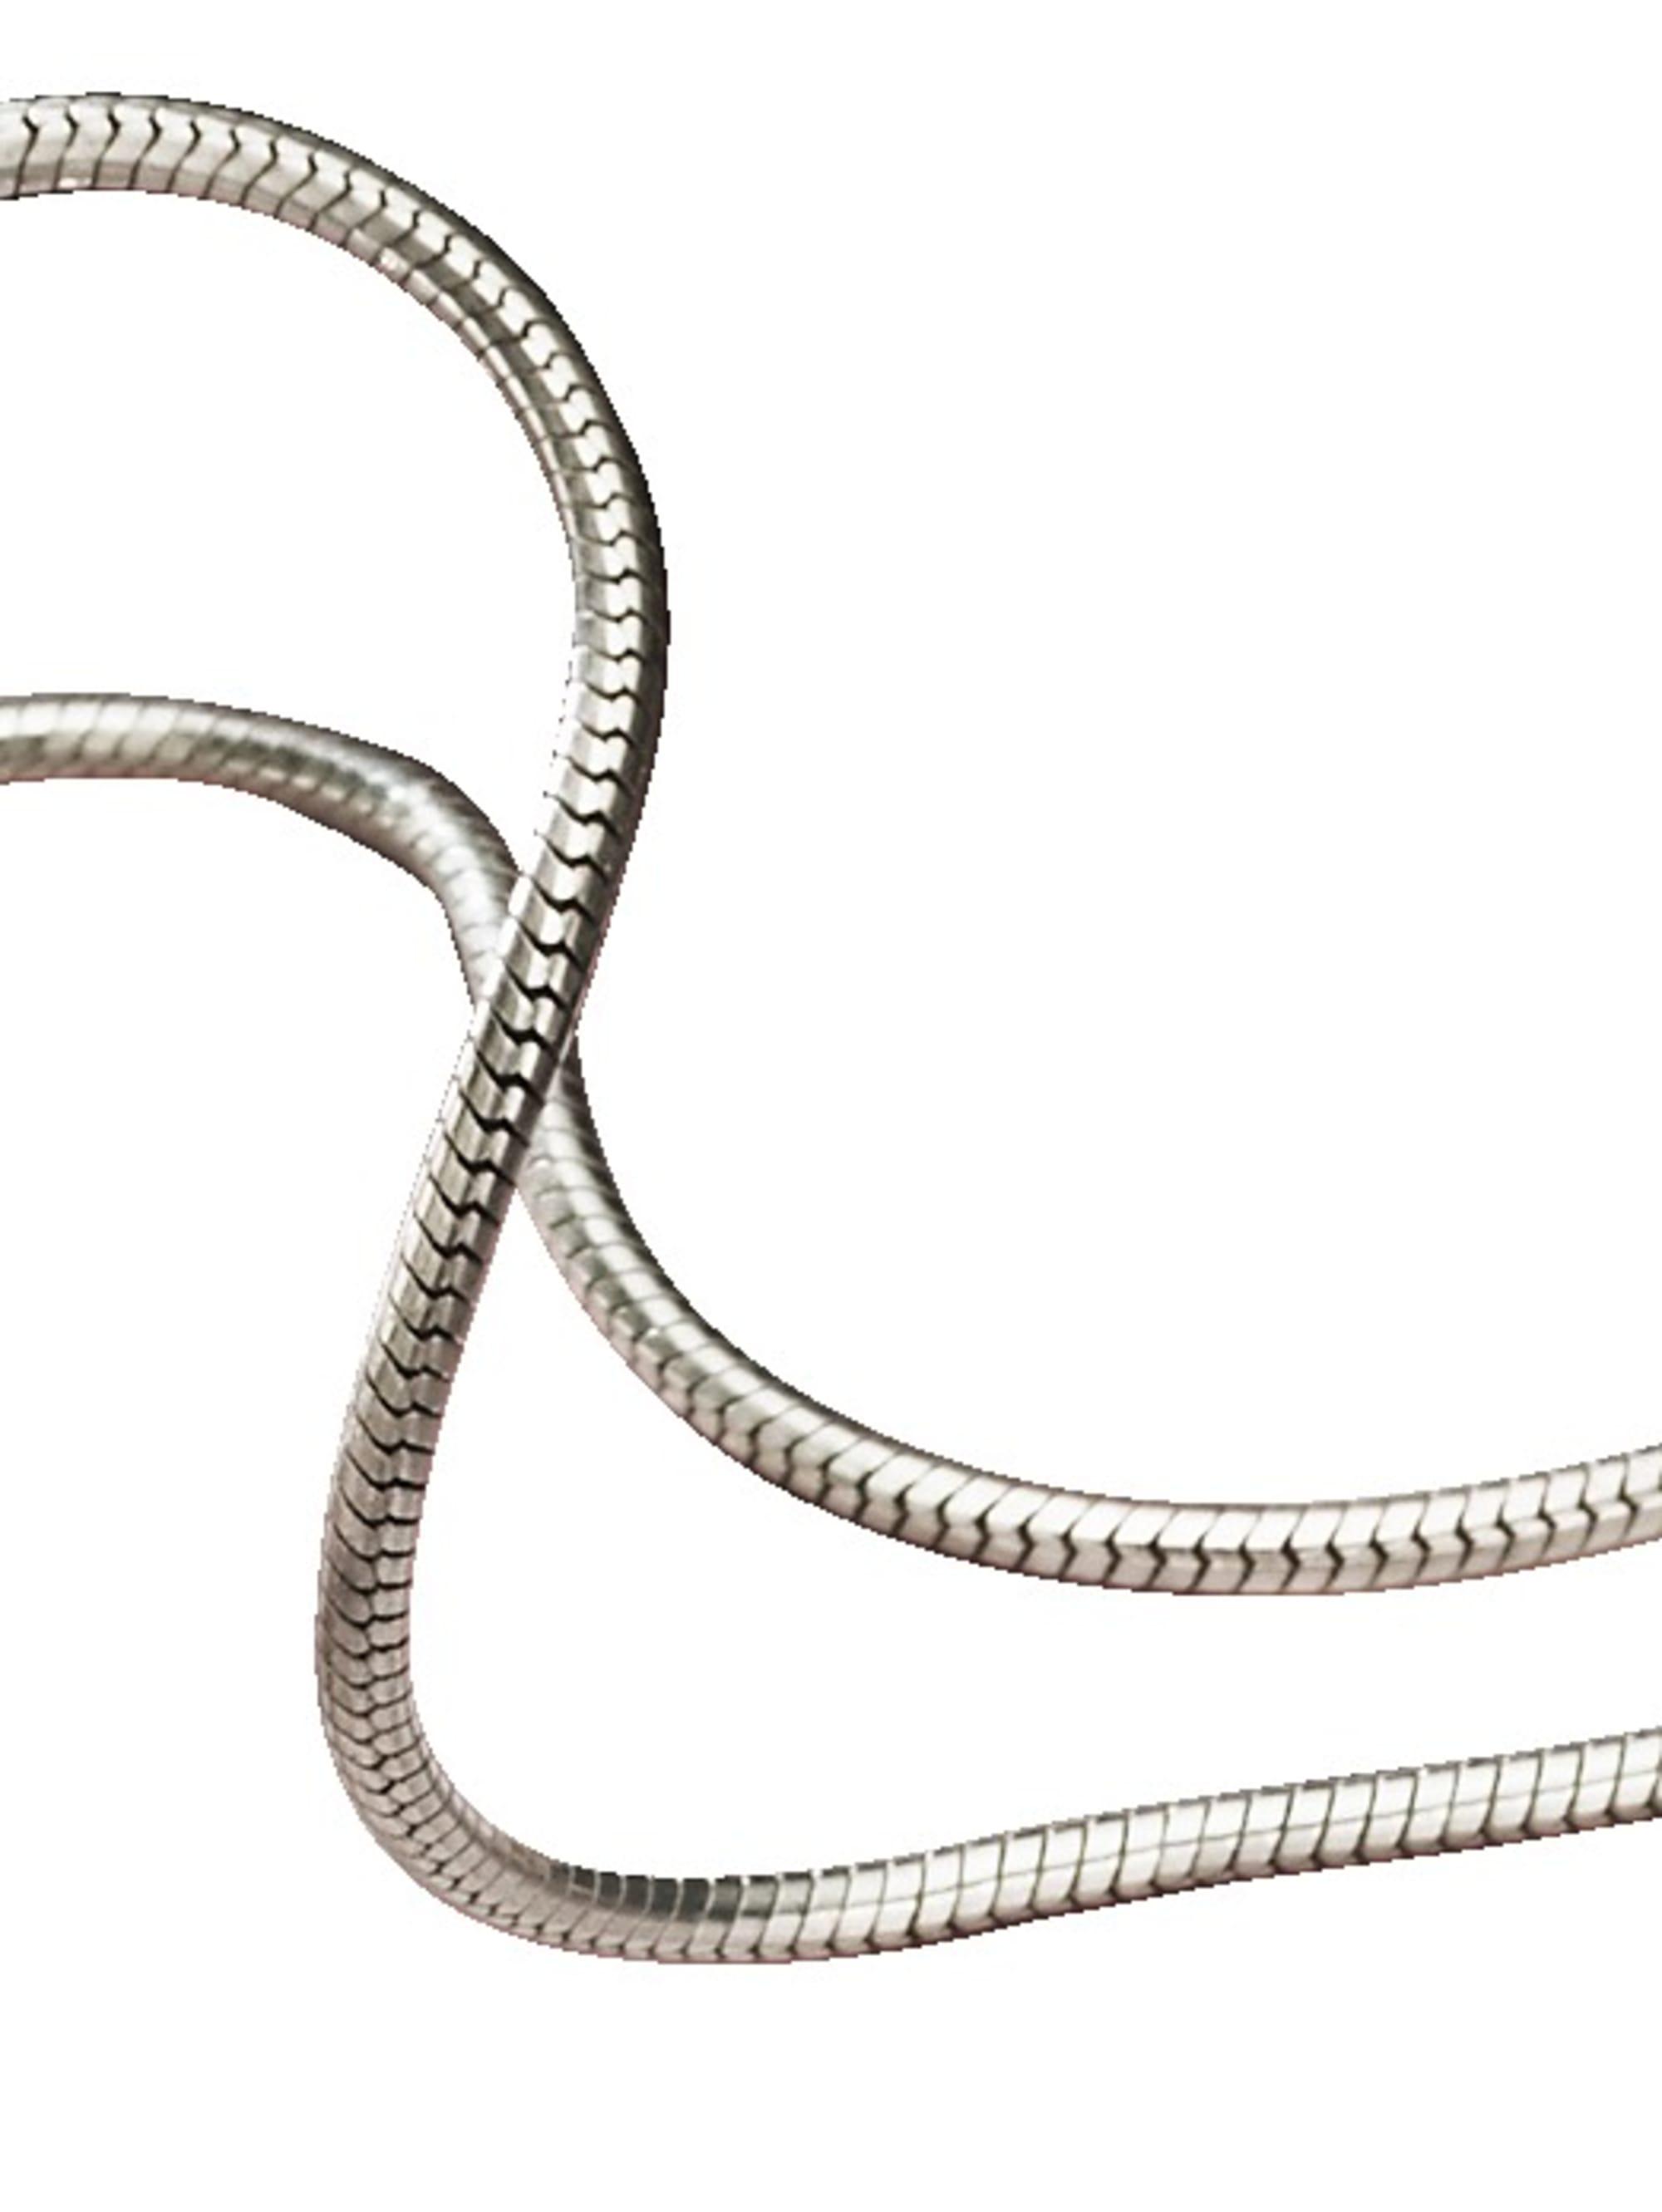 Schlangenkette in Silber 925 Fzmj5